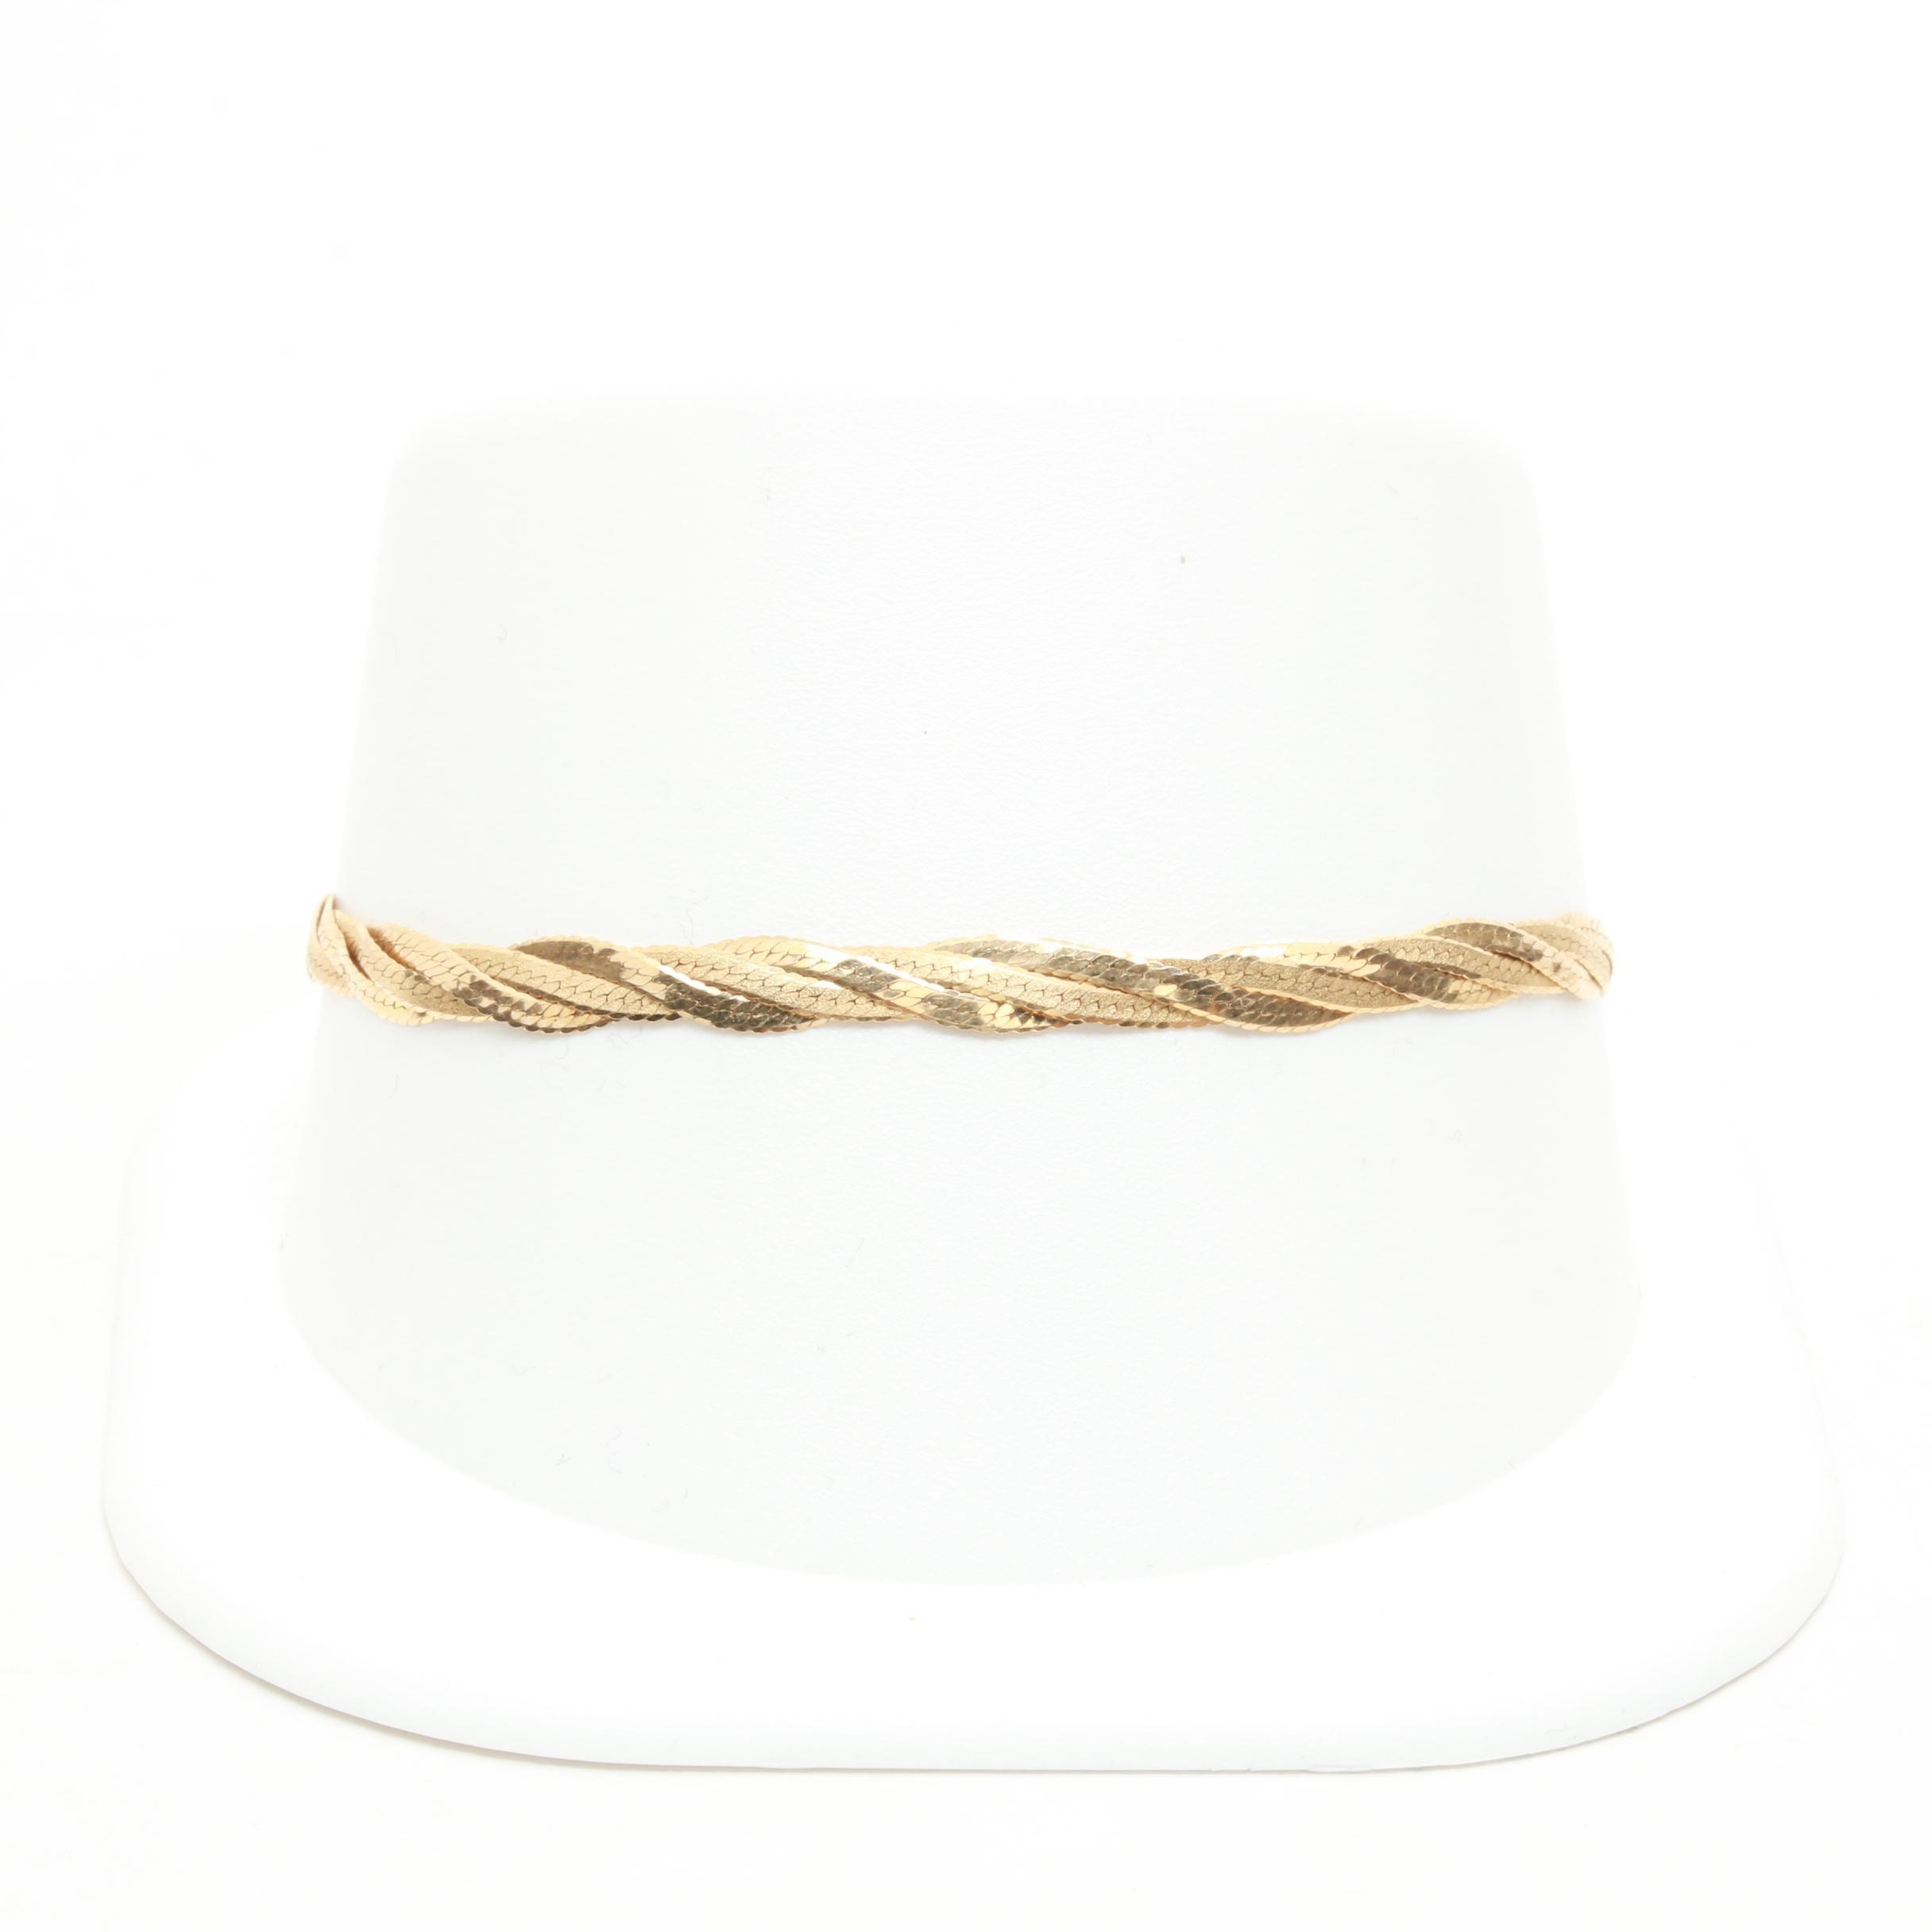 Aurafin 14K Yellow Gold Chain Bracelet